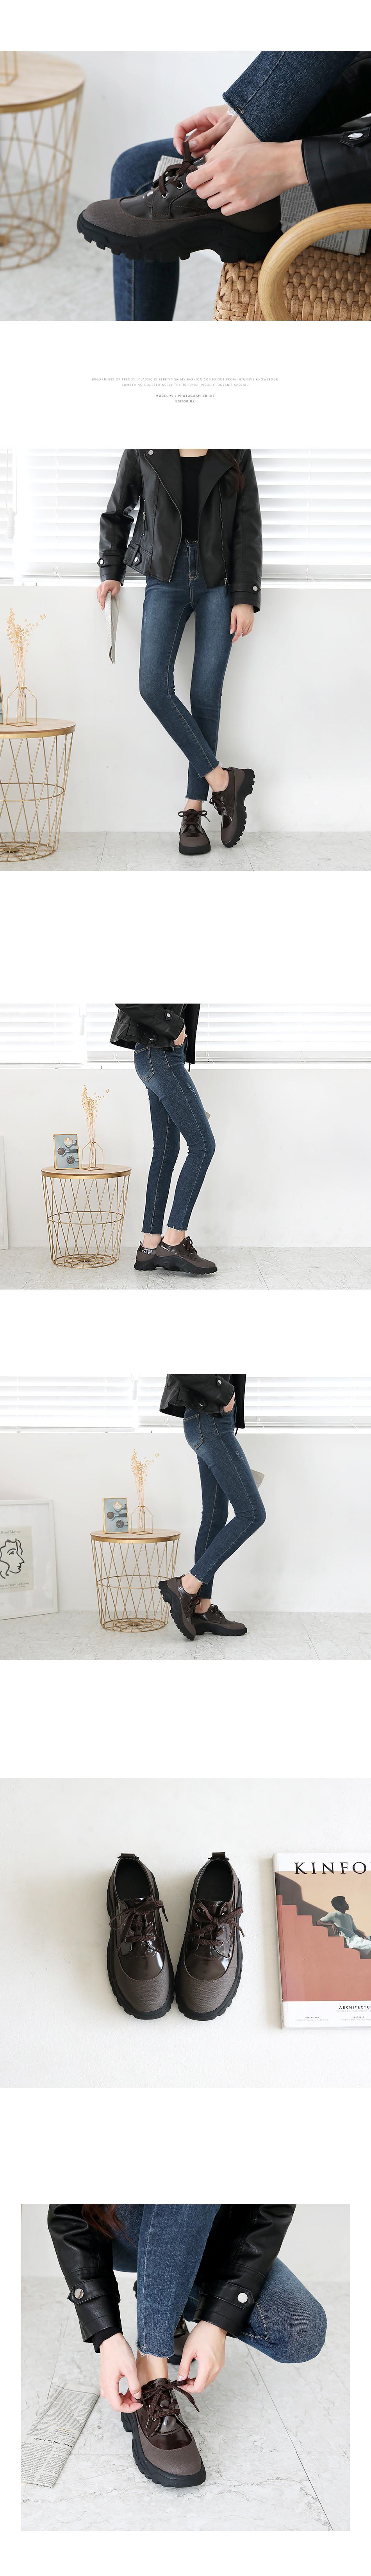 Toel's Sneakers Walker 3cm